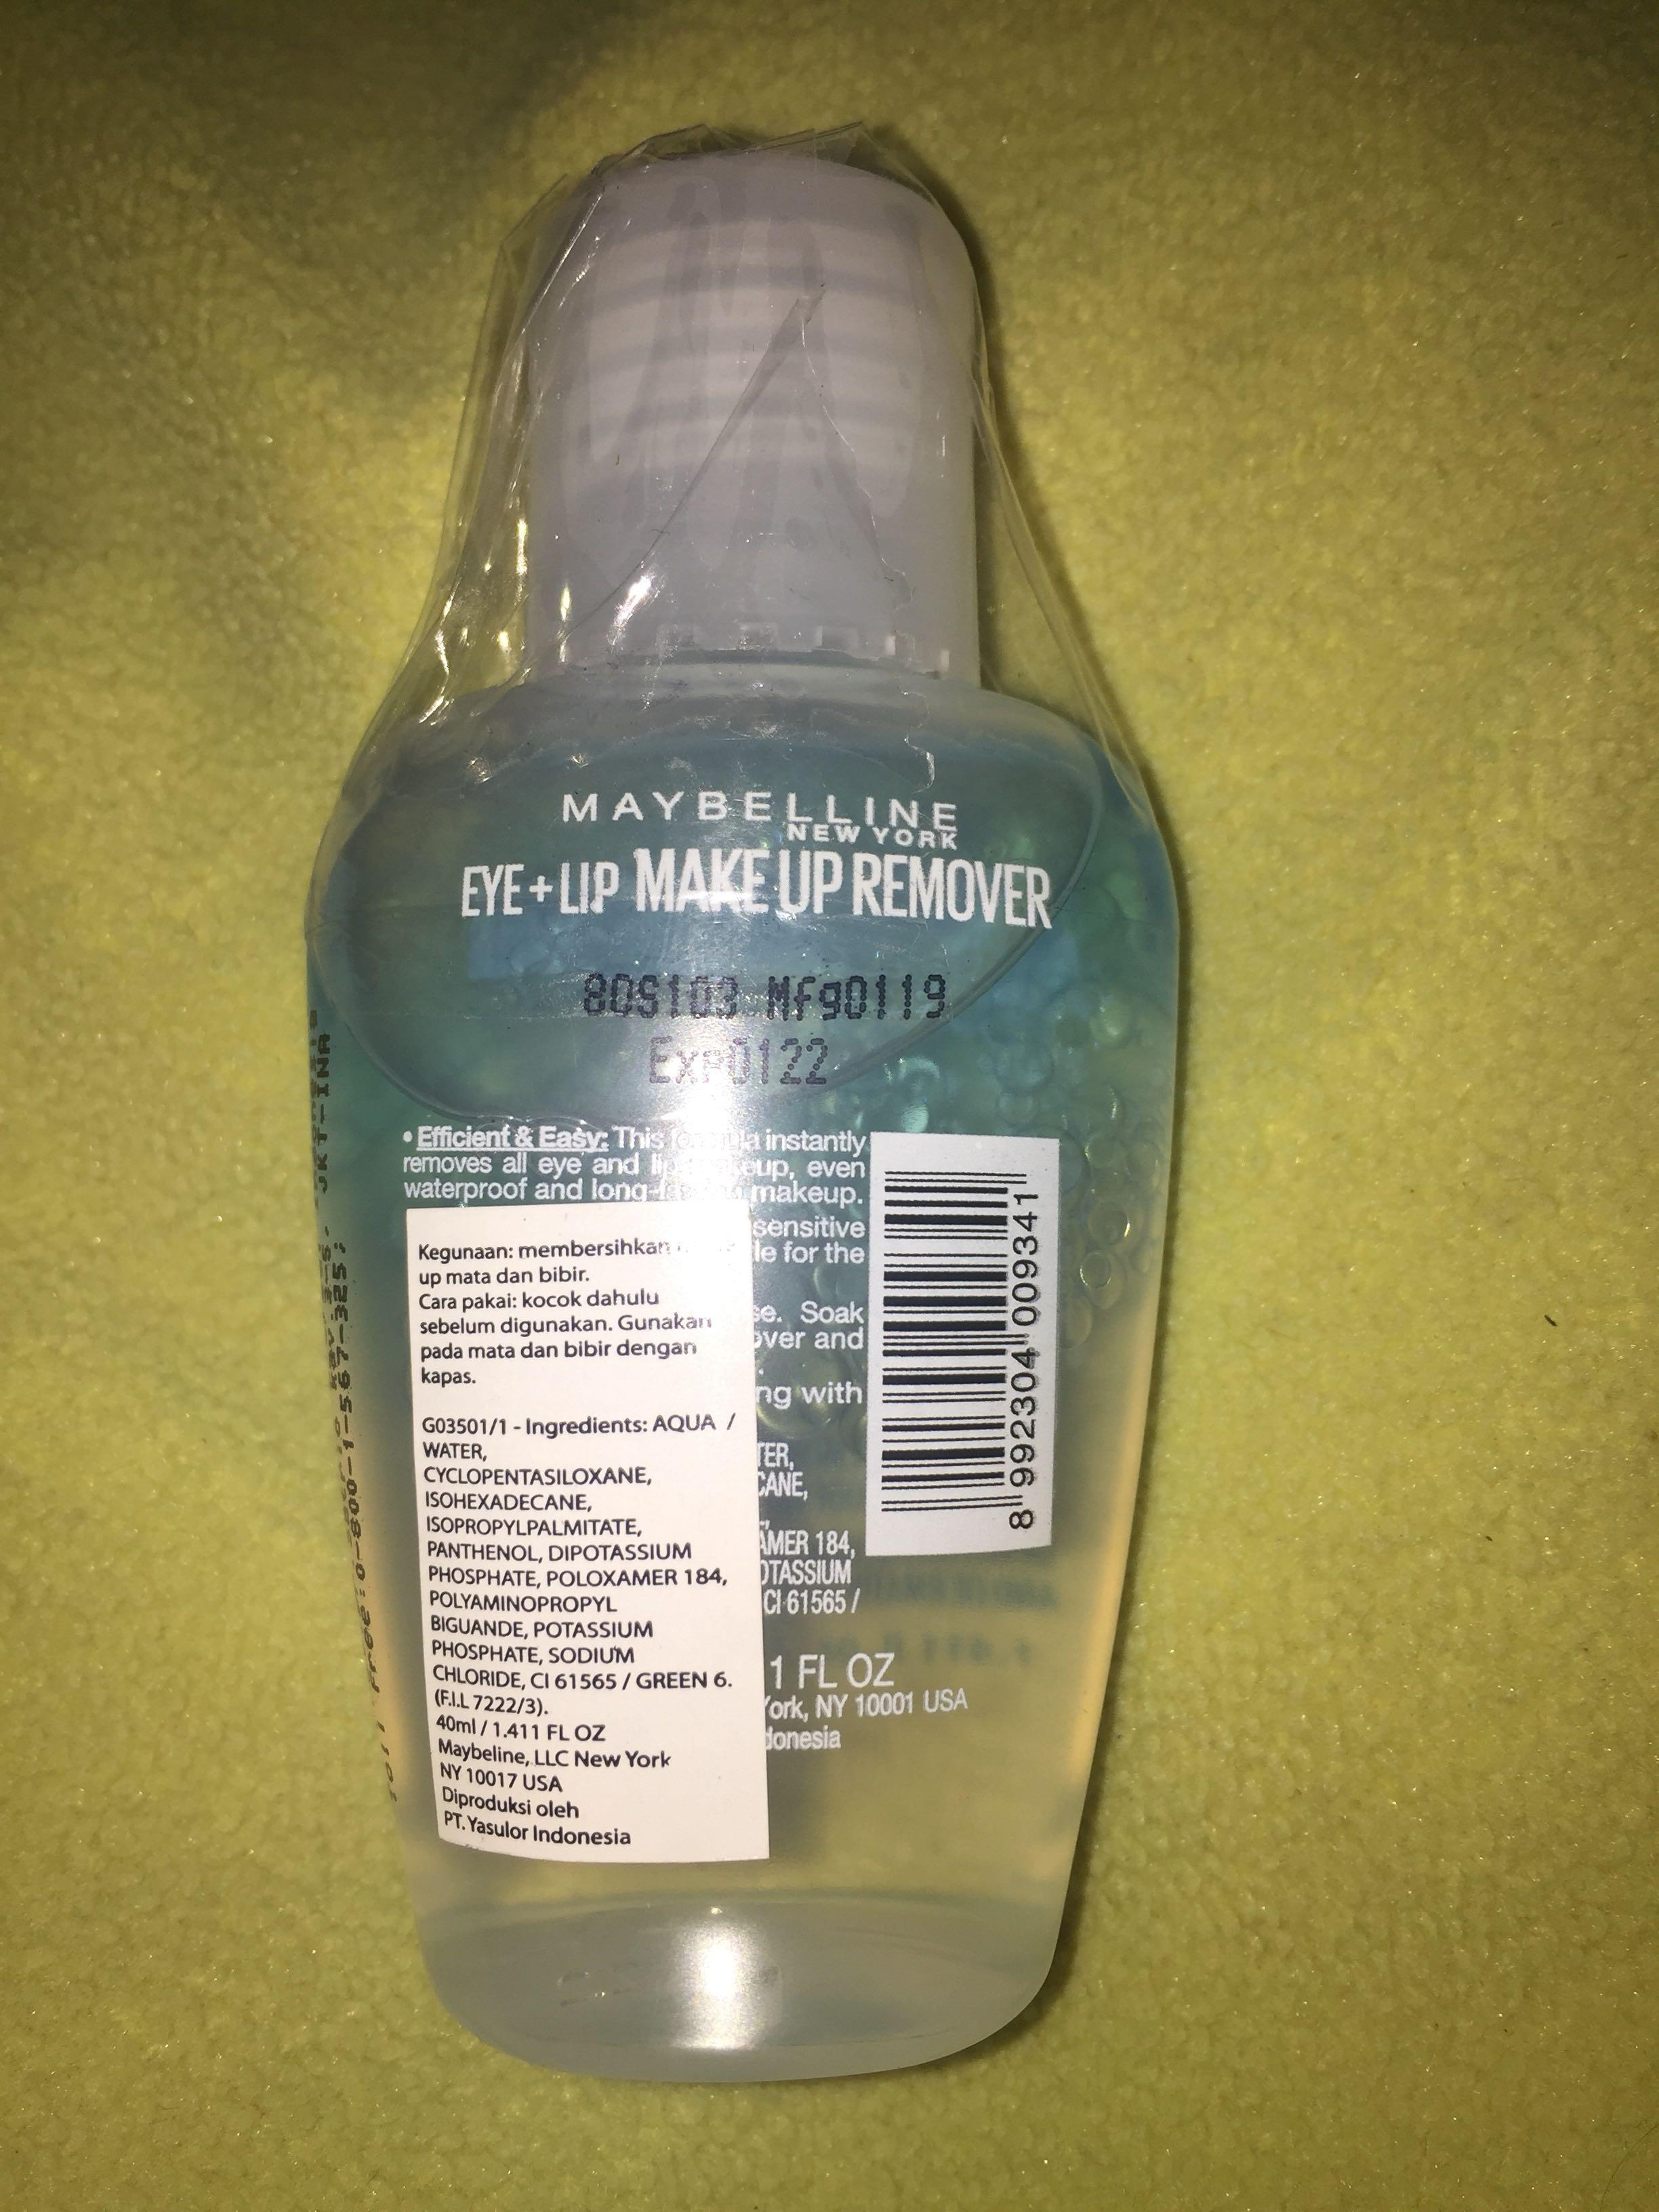 #BAPAU Maybelline Eye+Lip Make Up Remover